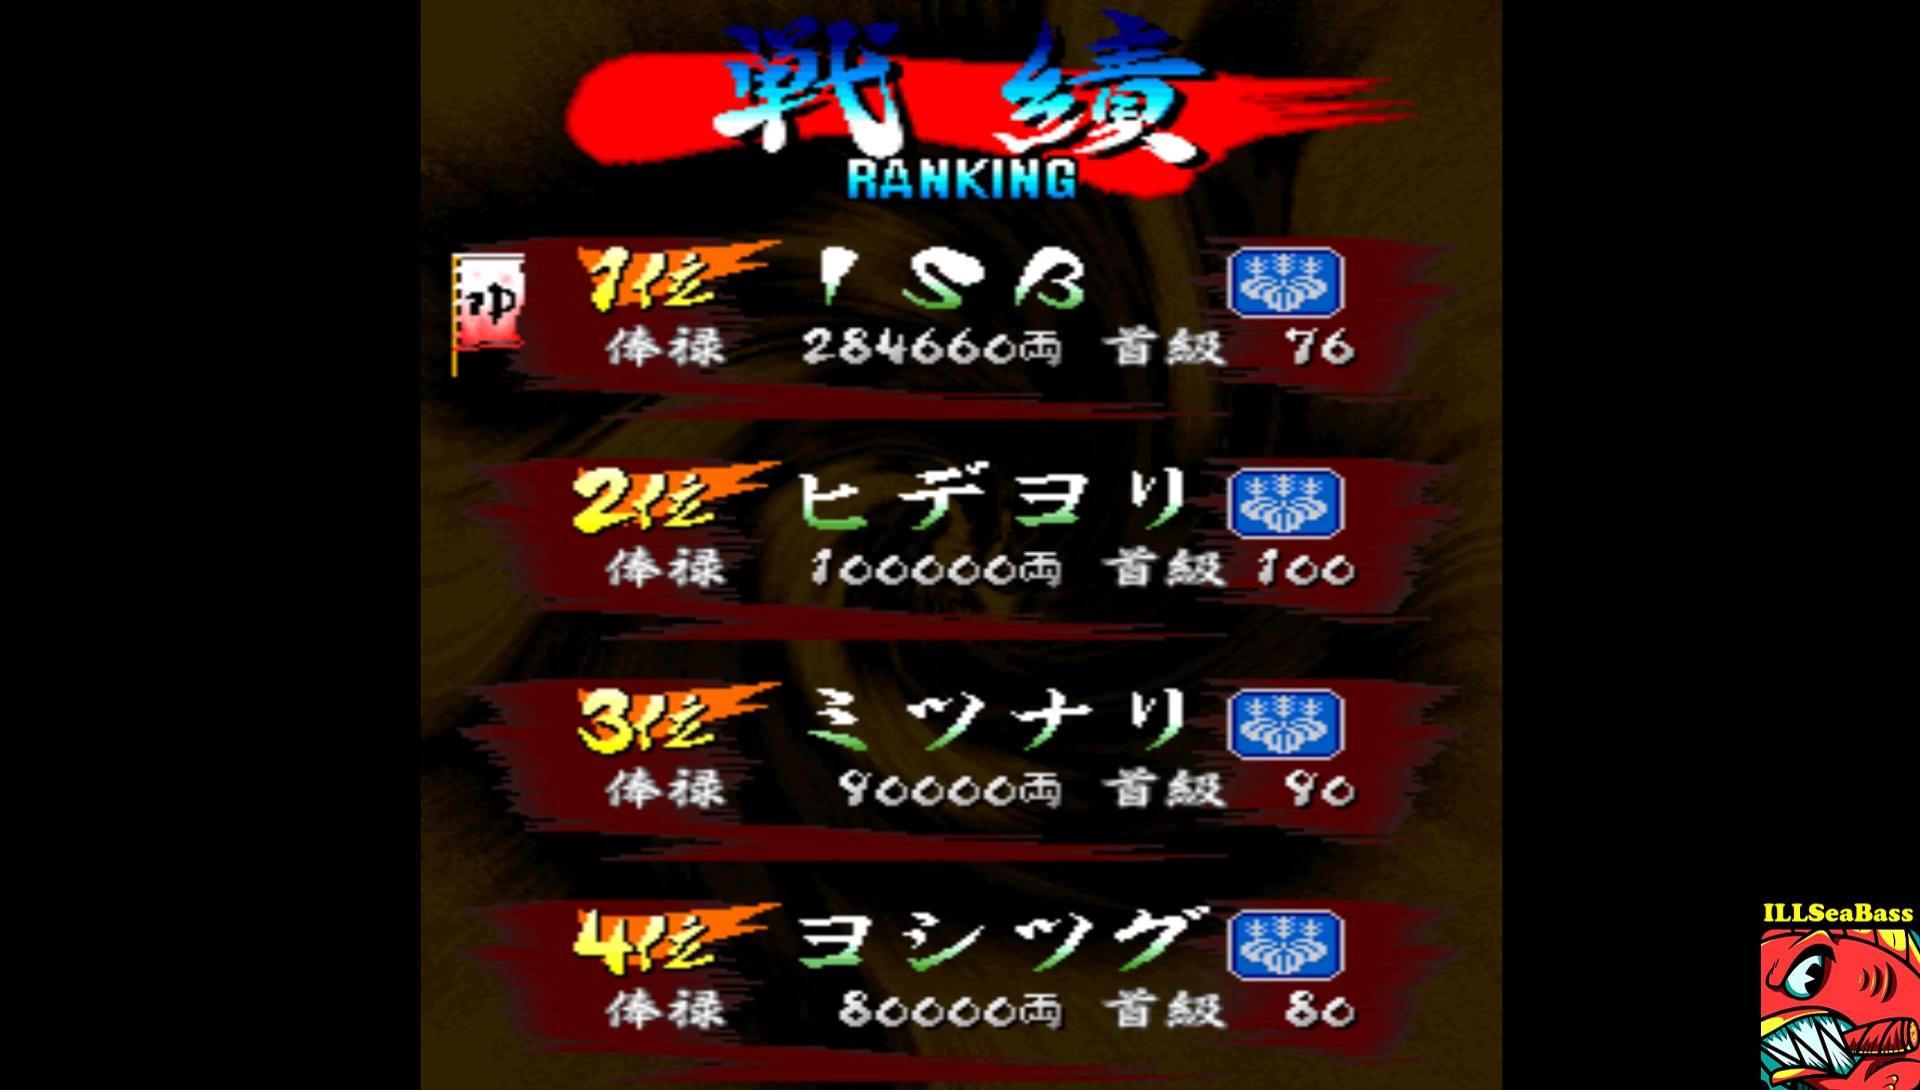 ILLSeaBass: Vasara (Arcade Emulated / M.A.M.E.) 284,660 points on 2017-02-10 13:19:00